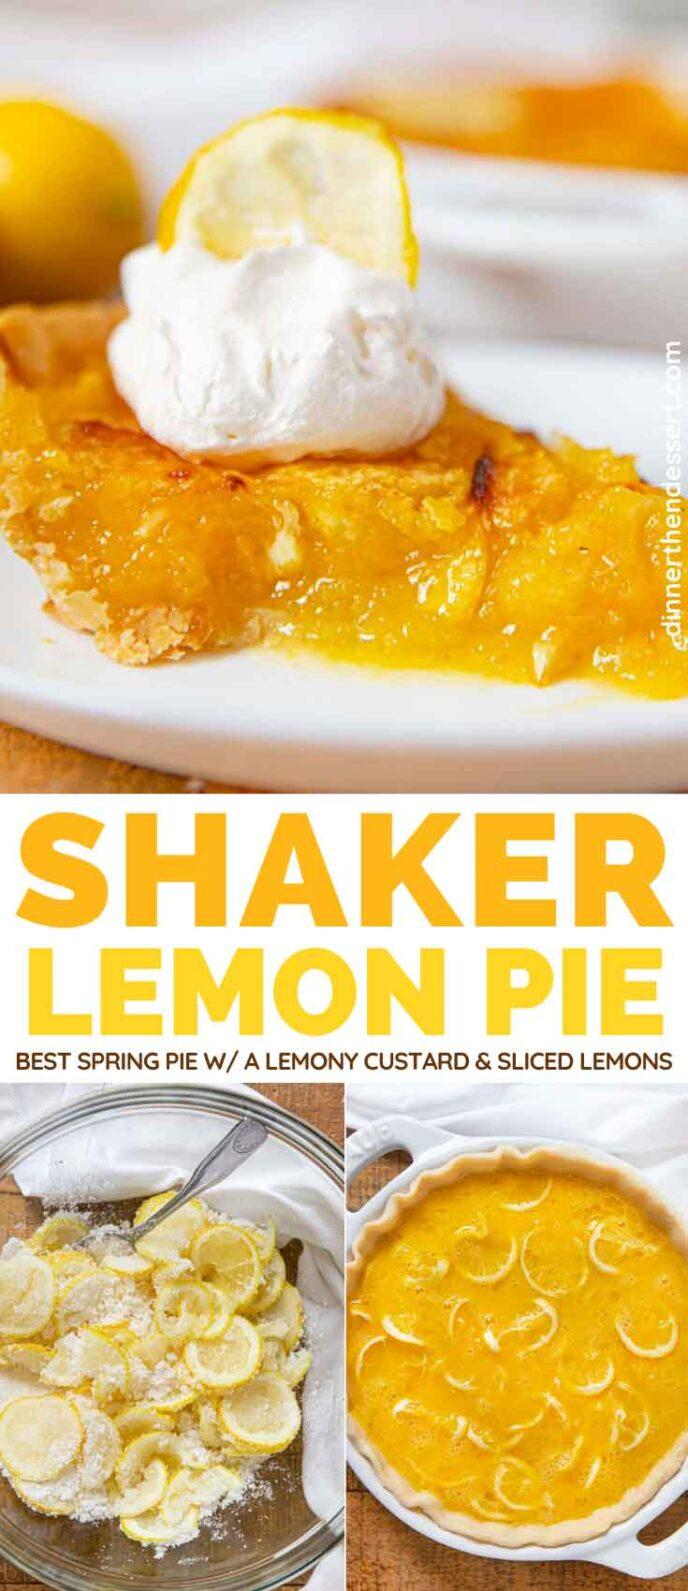 Shaker Lemon Pie collage